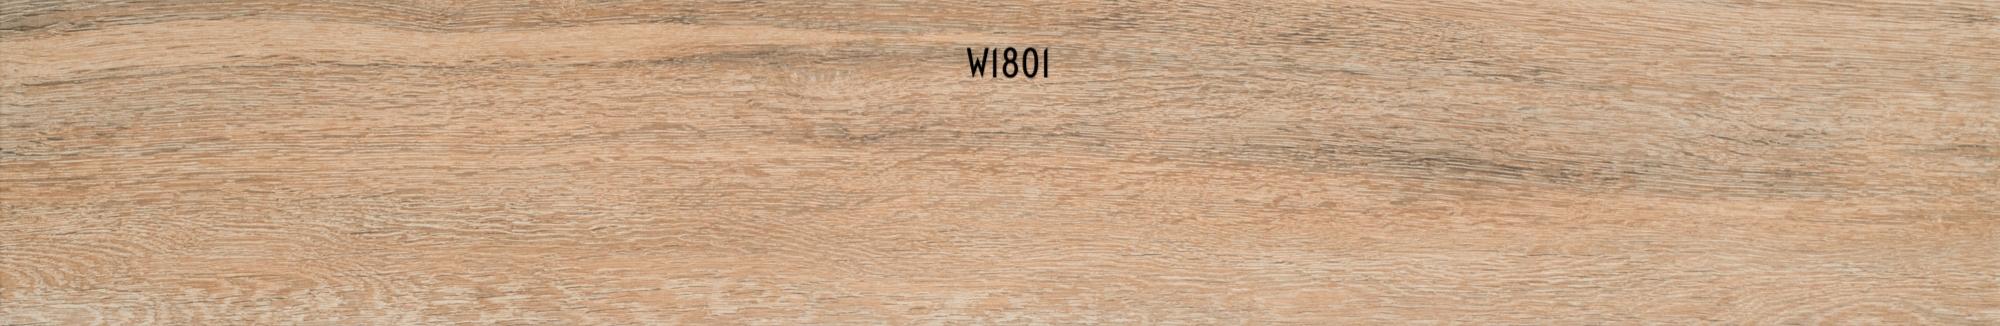 W1801